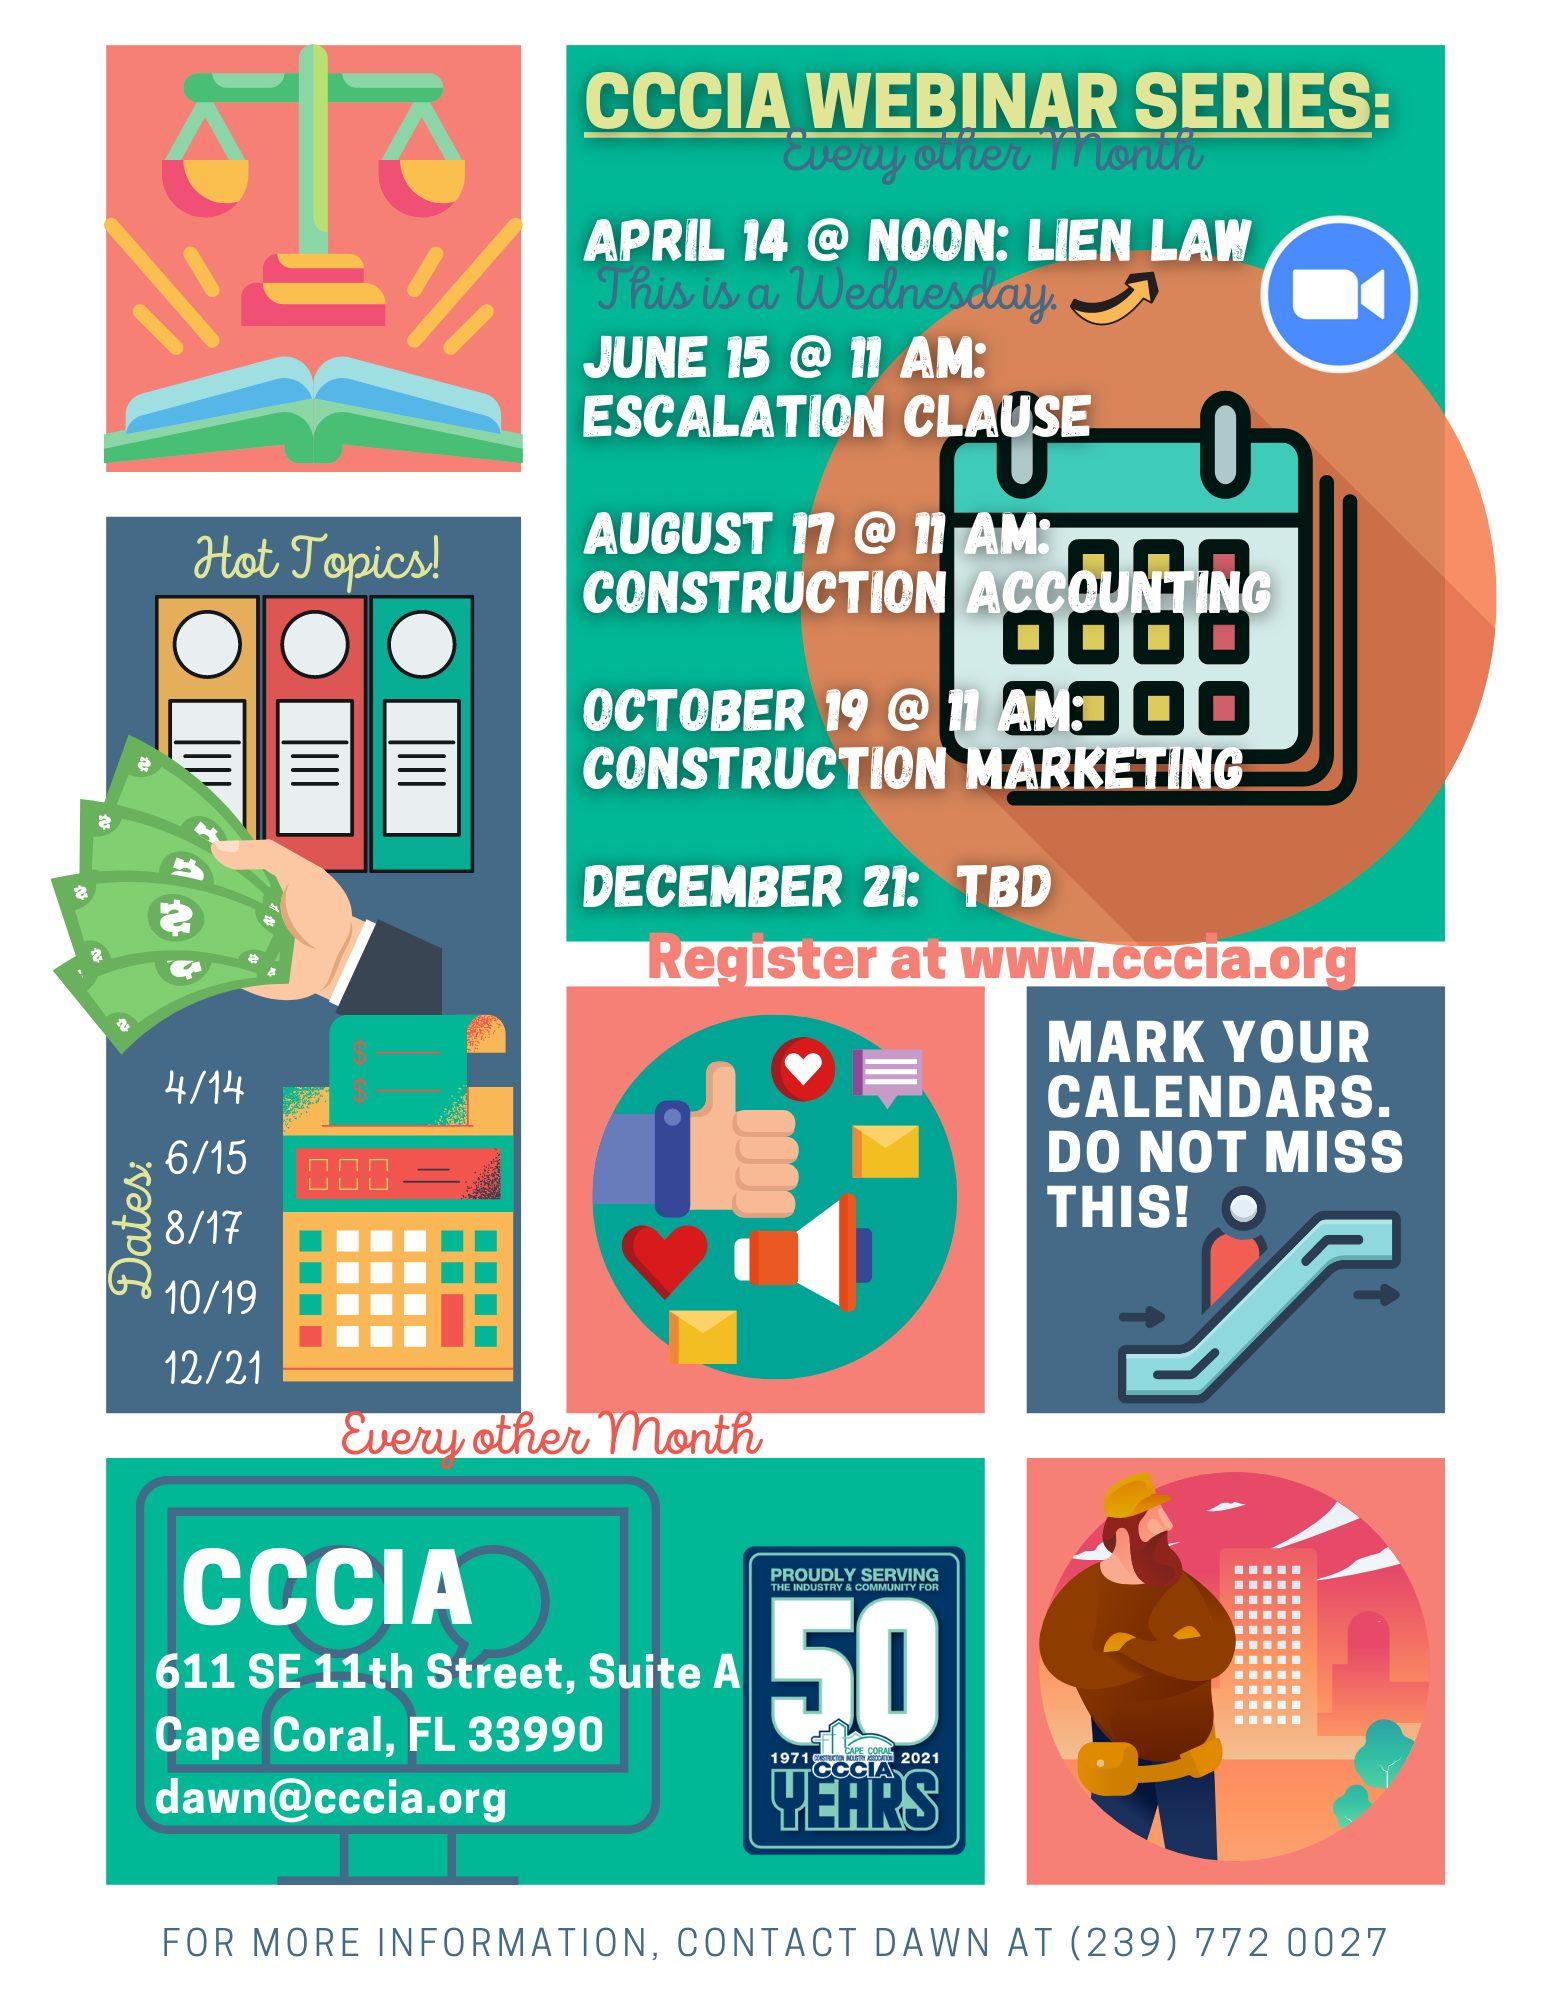 CCCIA 2021 Webinar Series Flyer